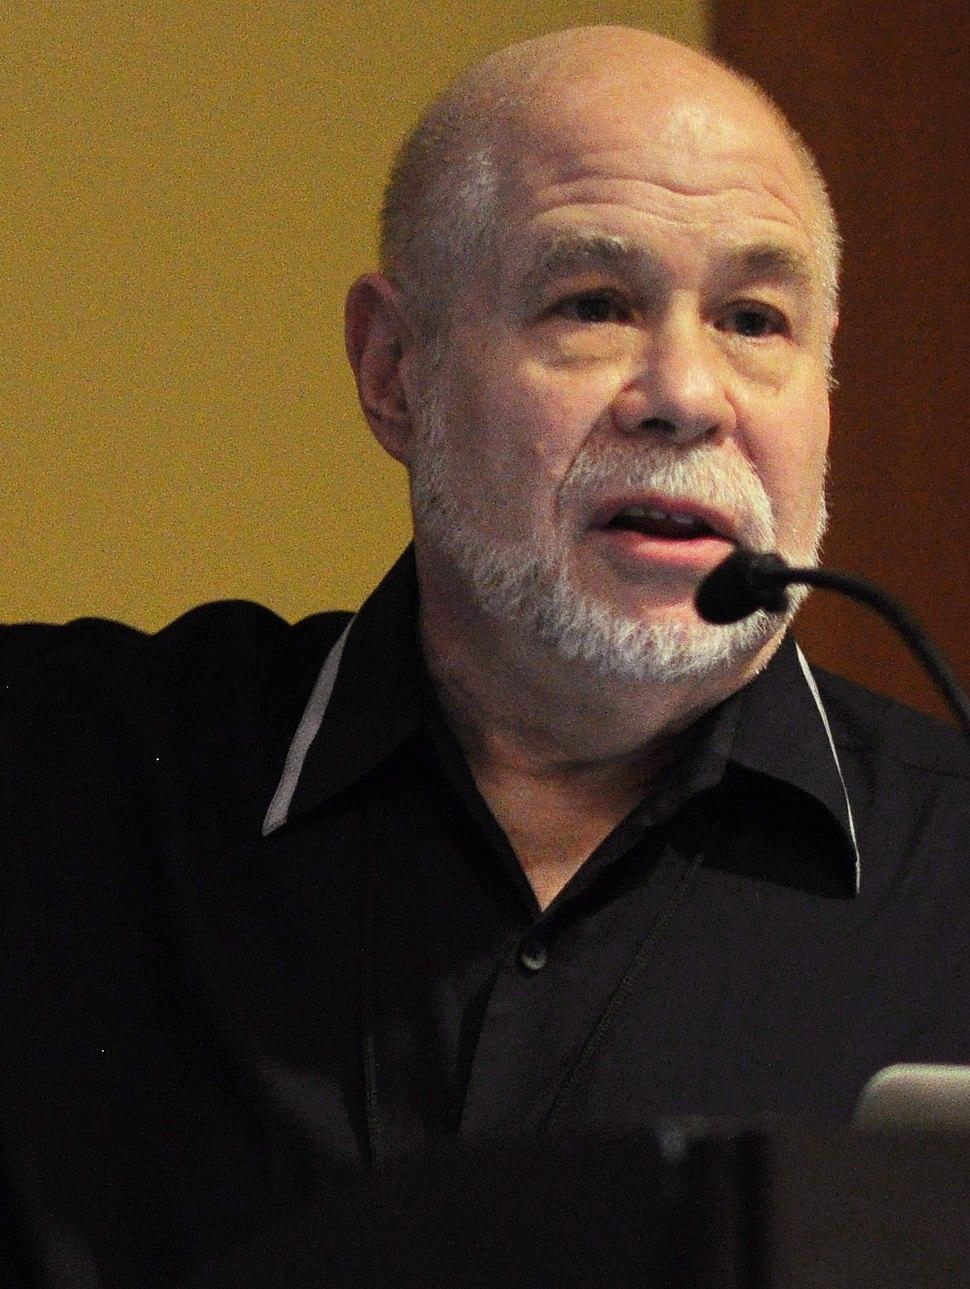 Richard Goldstein - Pop Conference 2015 - 02 (17182432526)